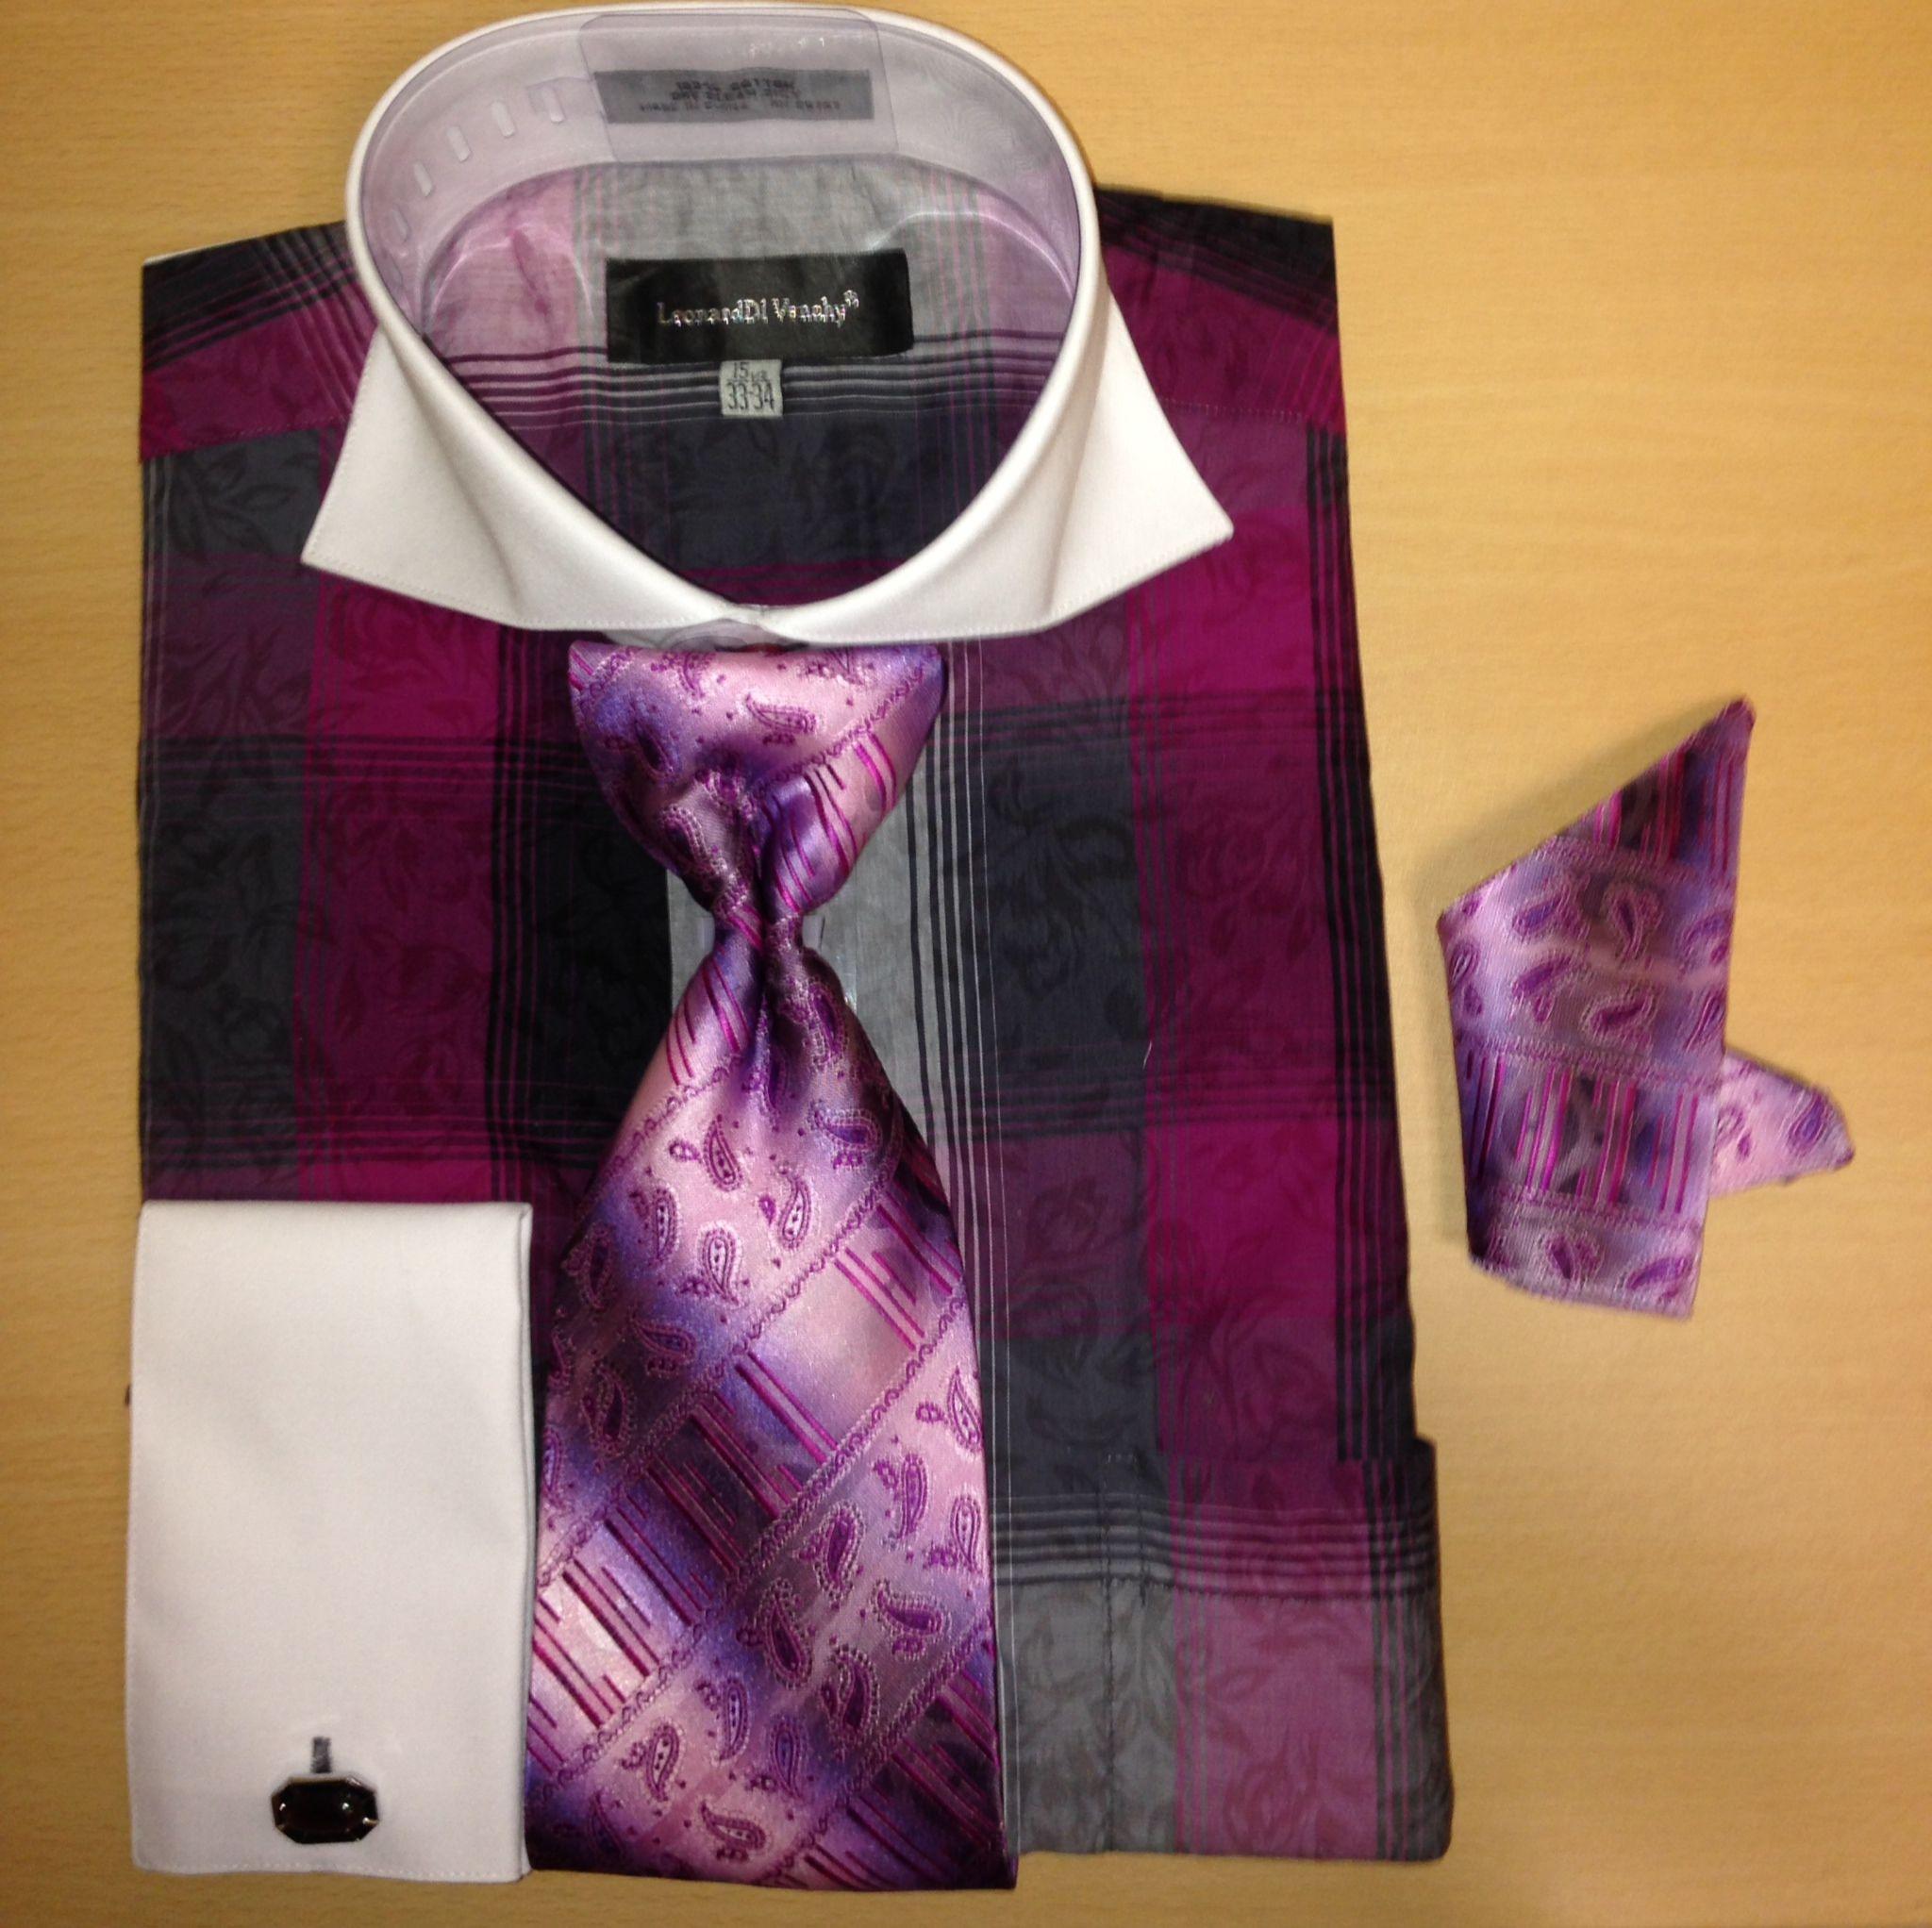 Men's Fashion Two-Tone w/ Paisley Mixture Cufflink Dress Shirt Set - Purple to Black